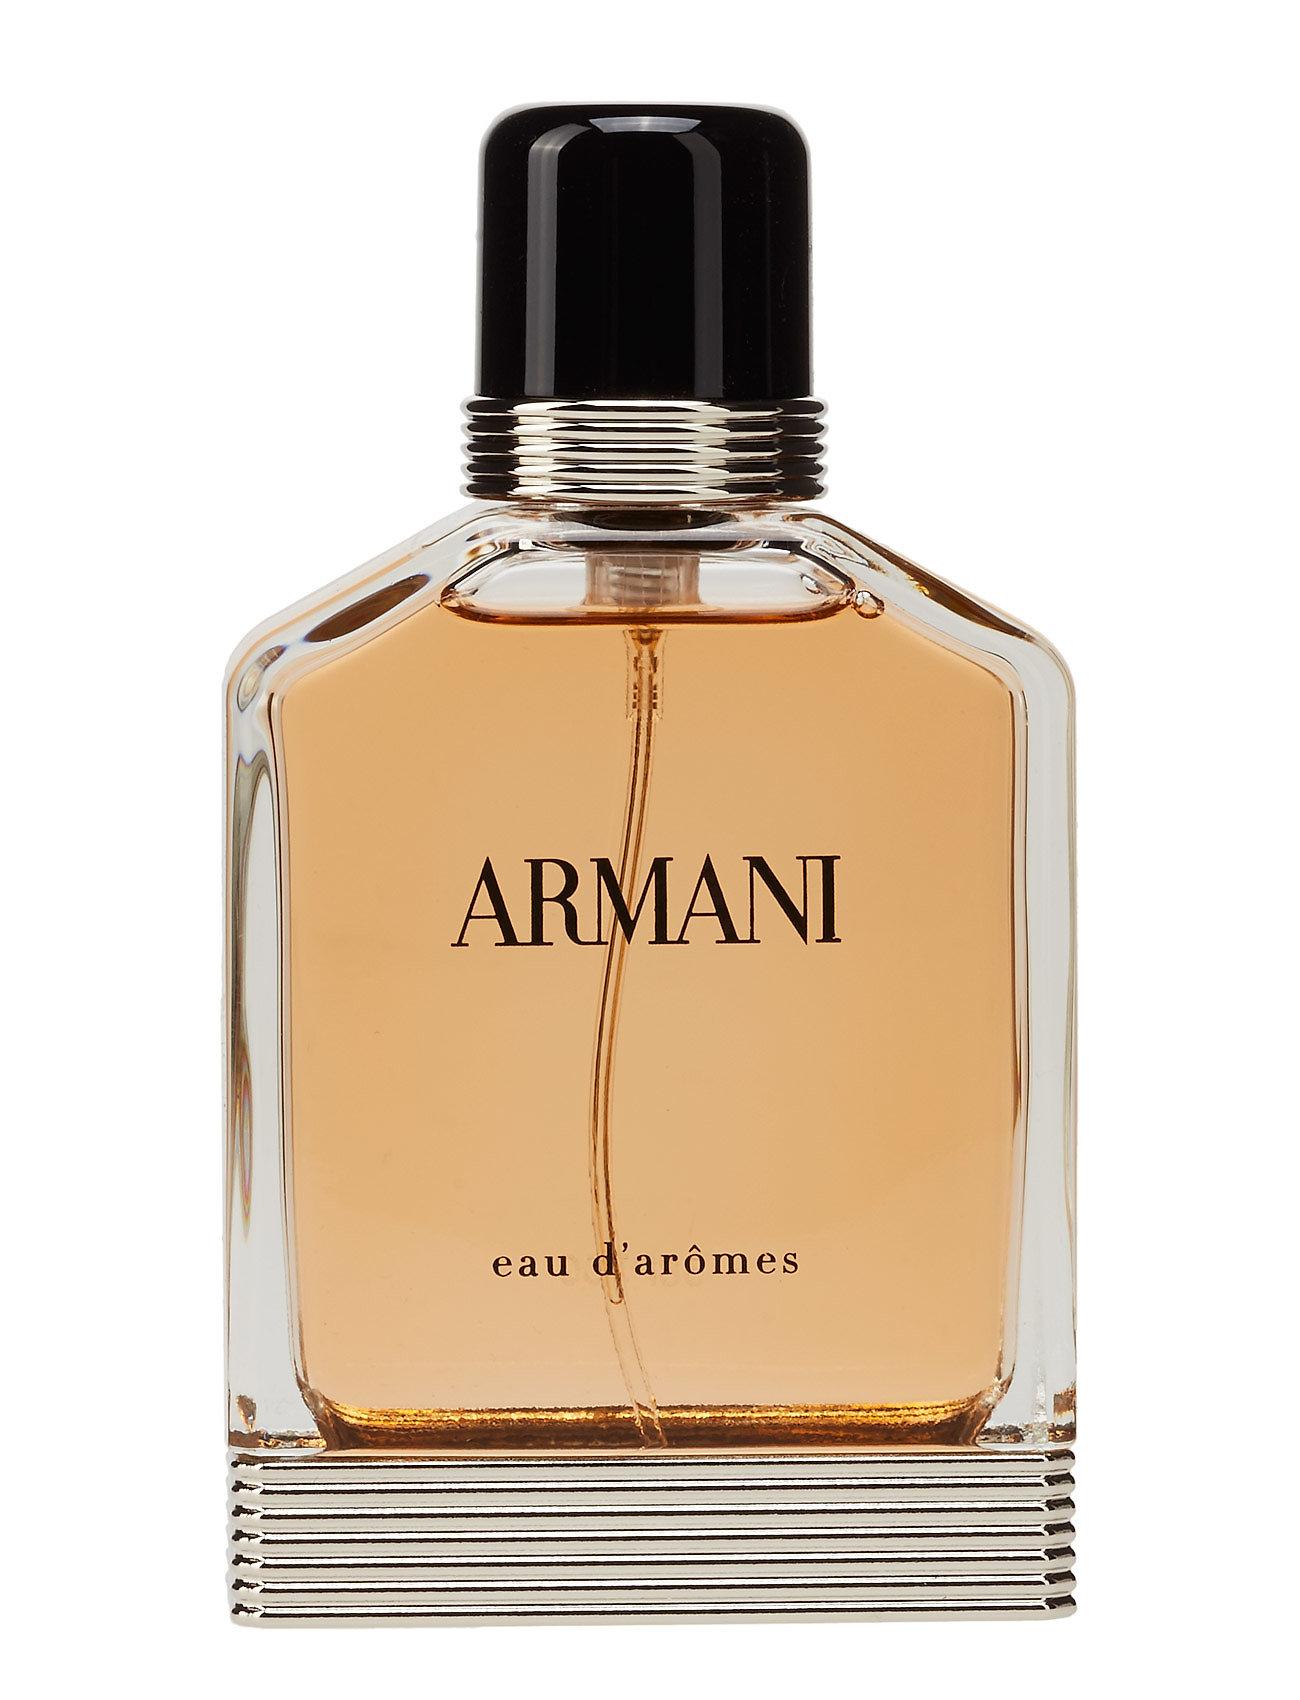 Armani eau d'aromes eau de toilette 50ml fra giorgio armani fra boozt.com dk